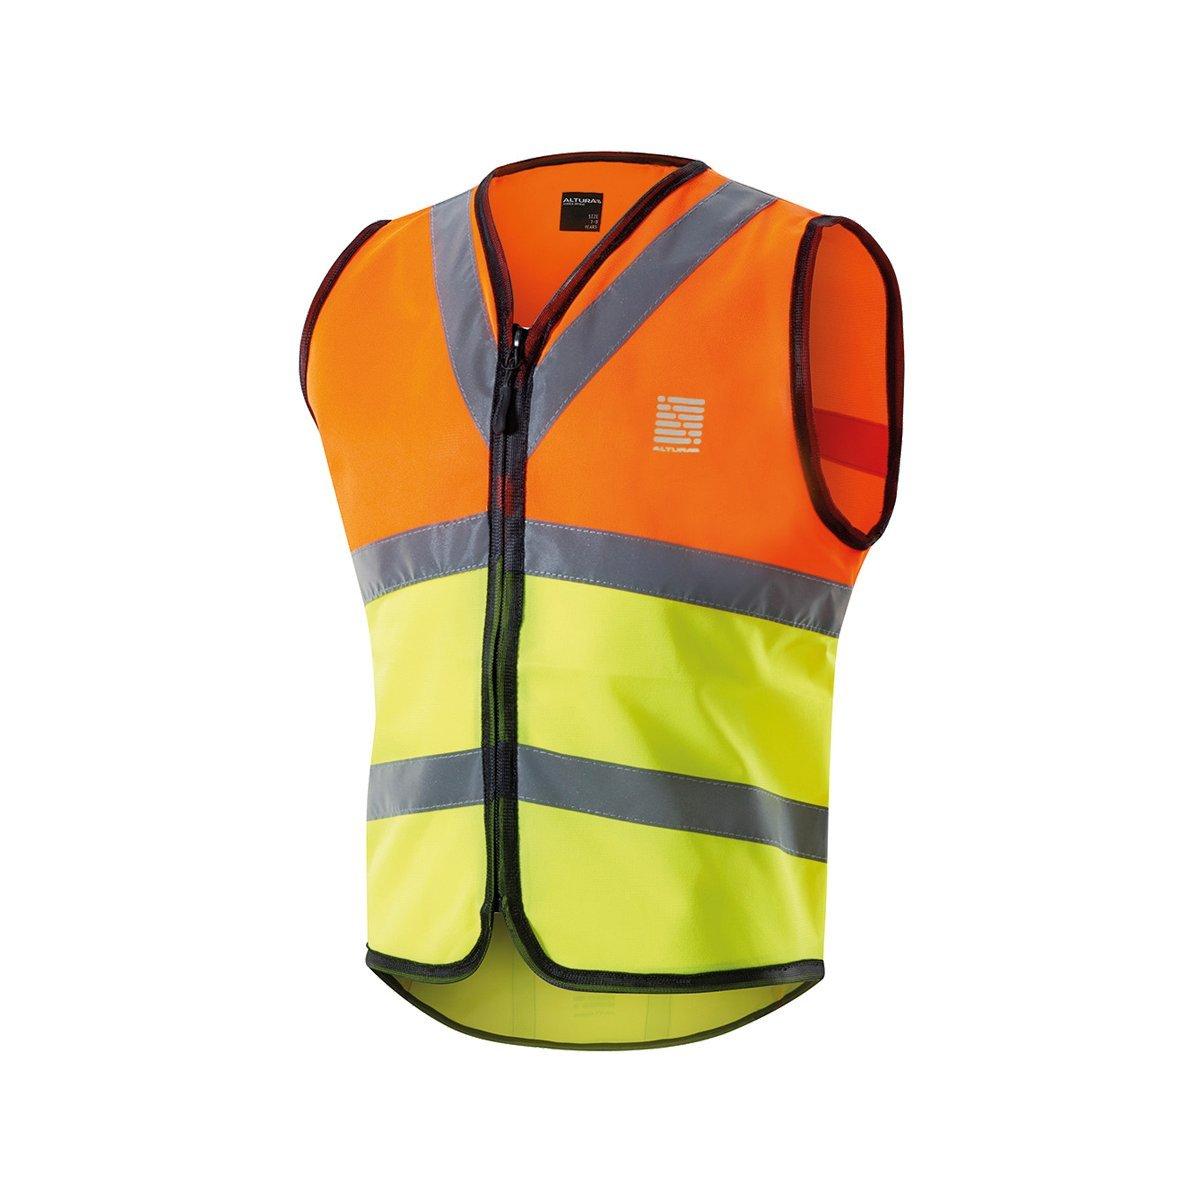 Altura Men's Nightvision Safety Vest - Hi Viz Yellow, Large